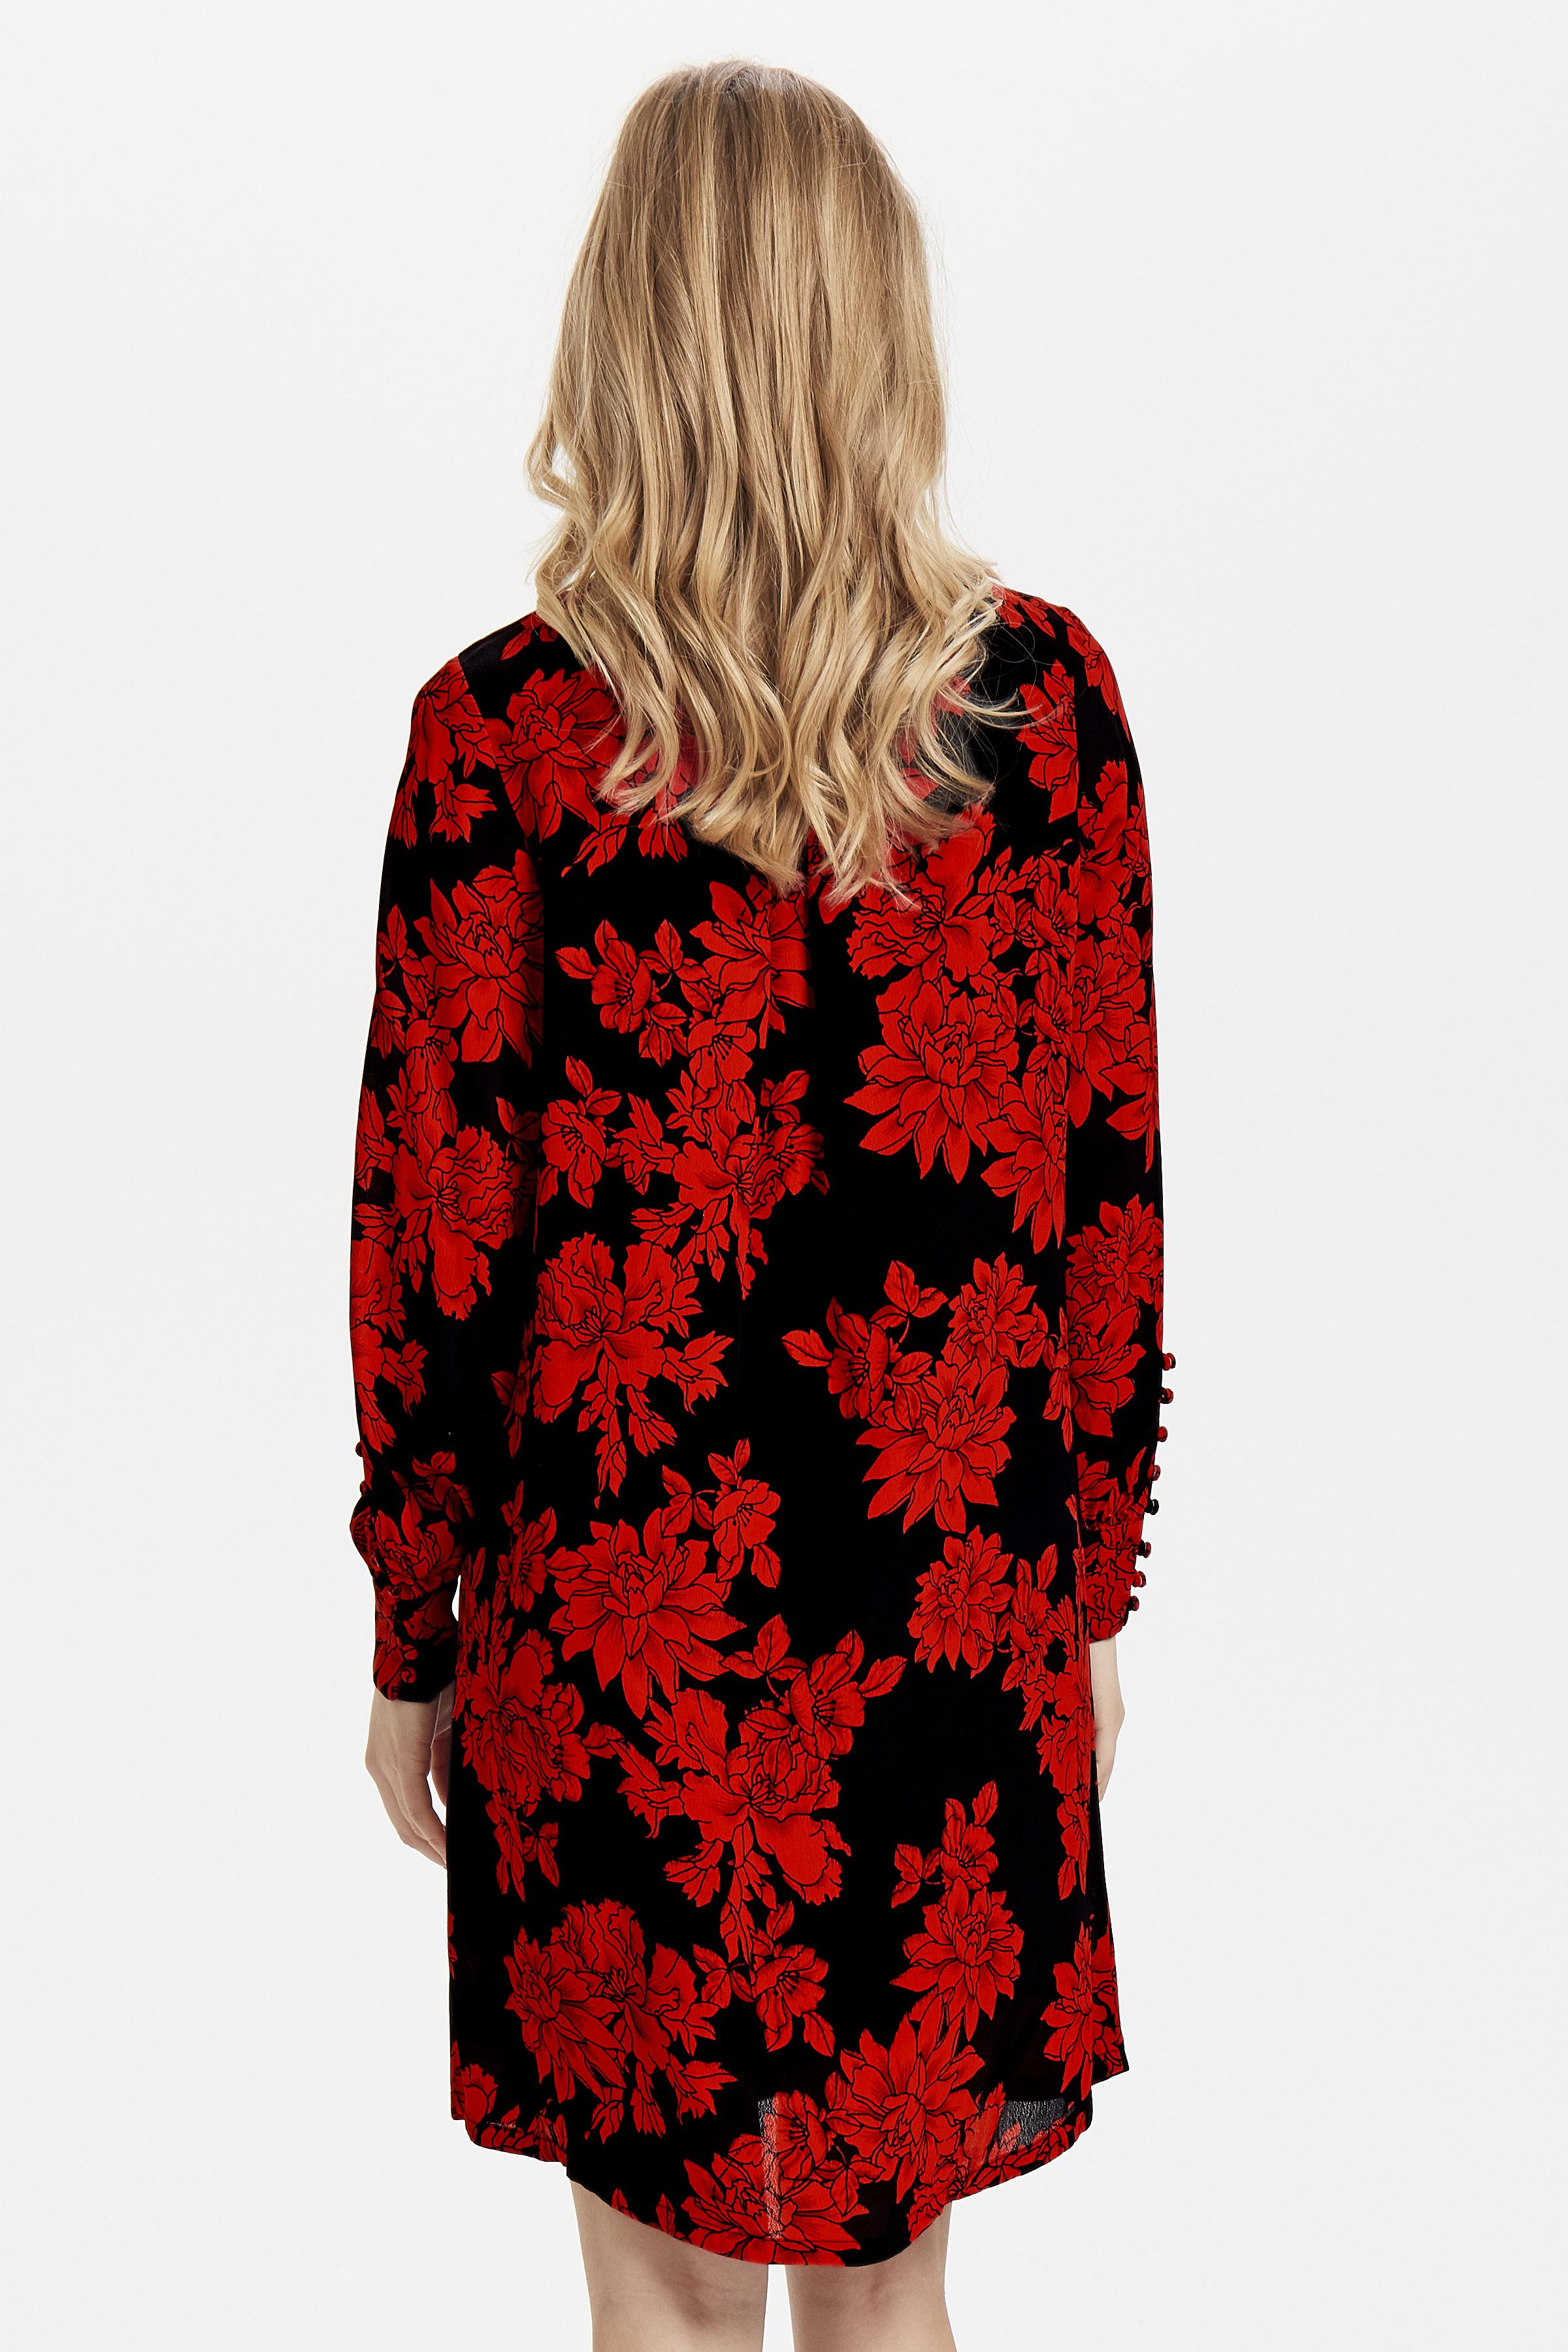 Black w. red flowers Klänning från b.young – Köp Black w. red flowers Klänning från storlek 36-44 här